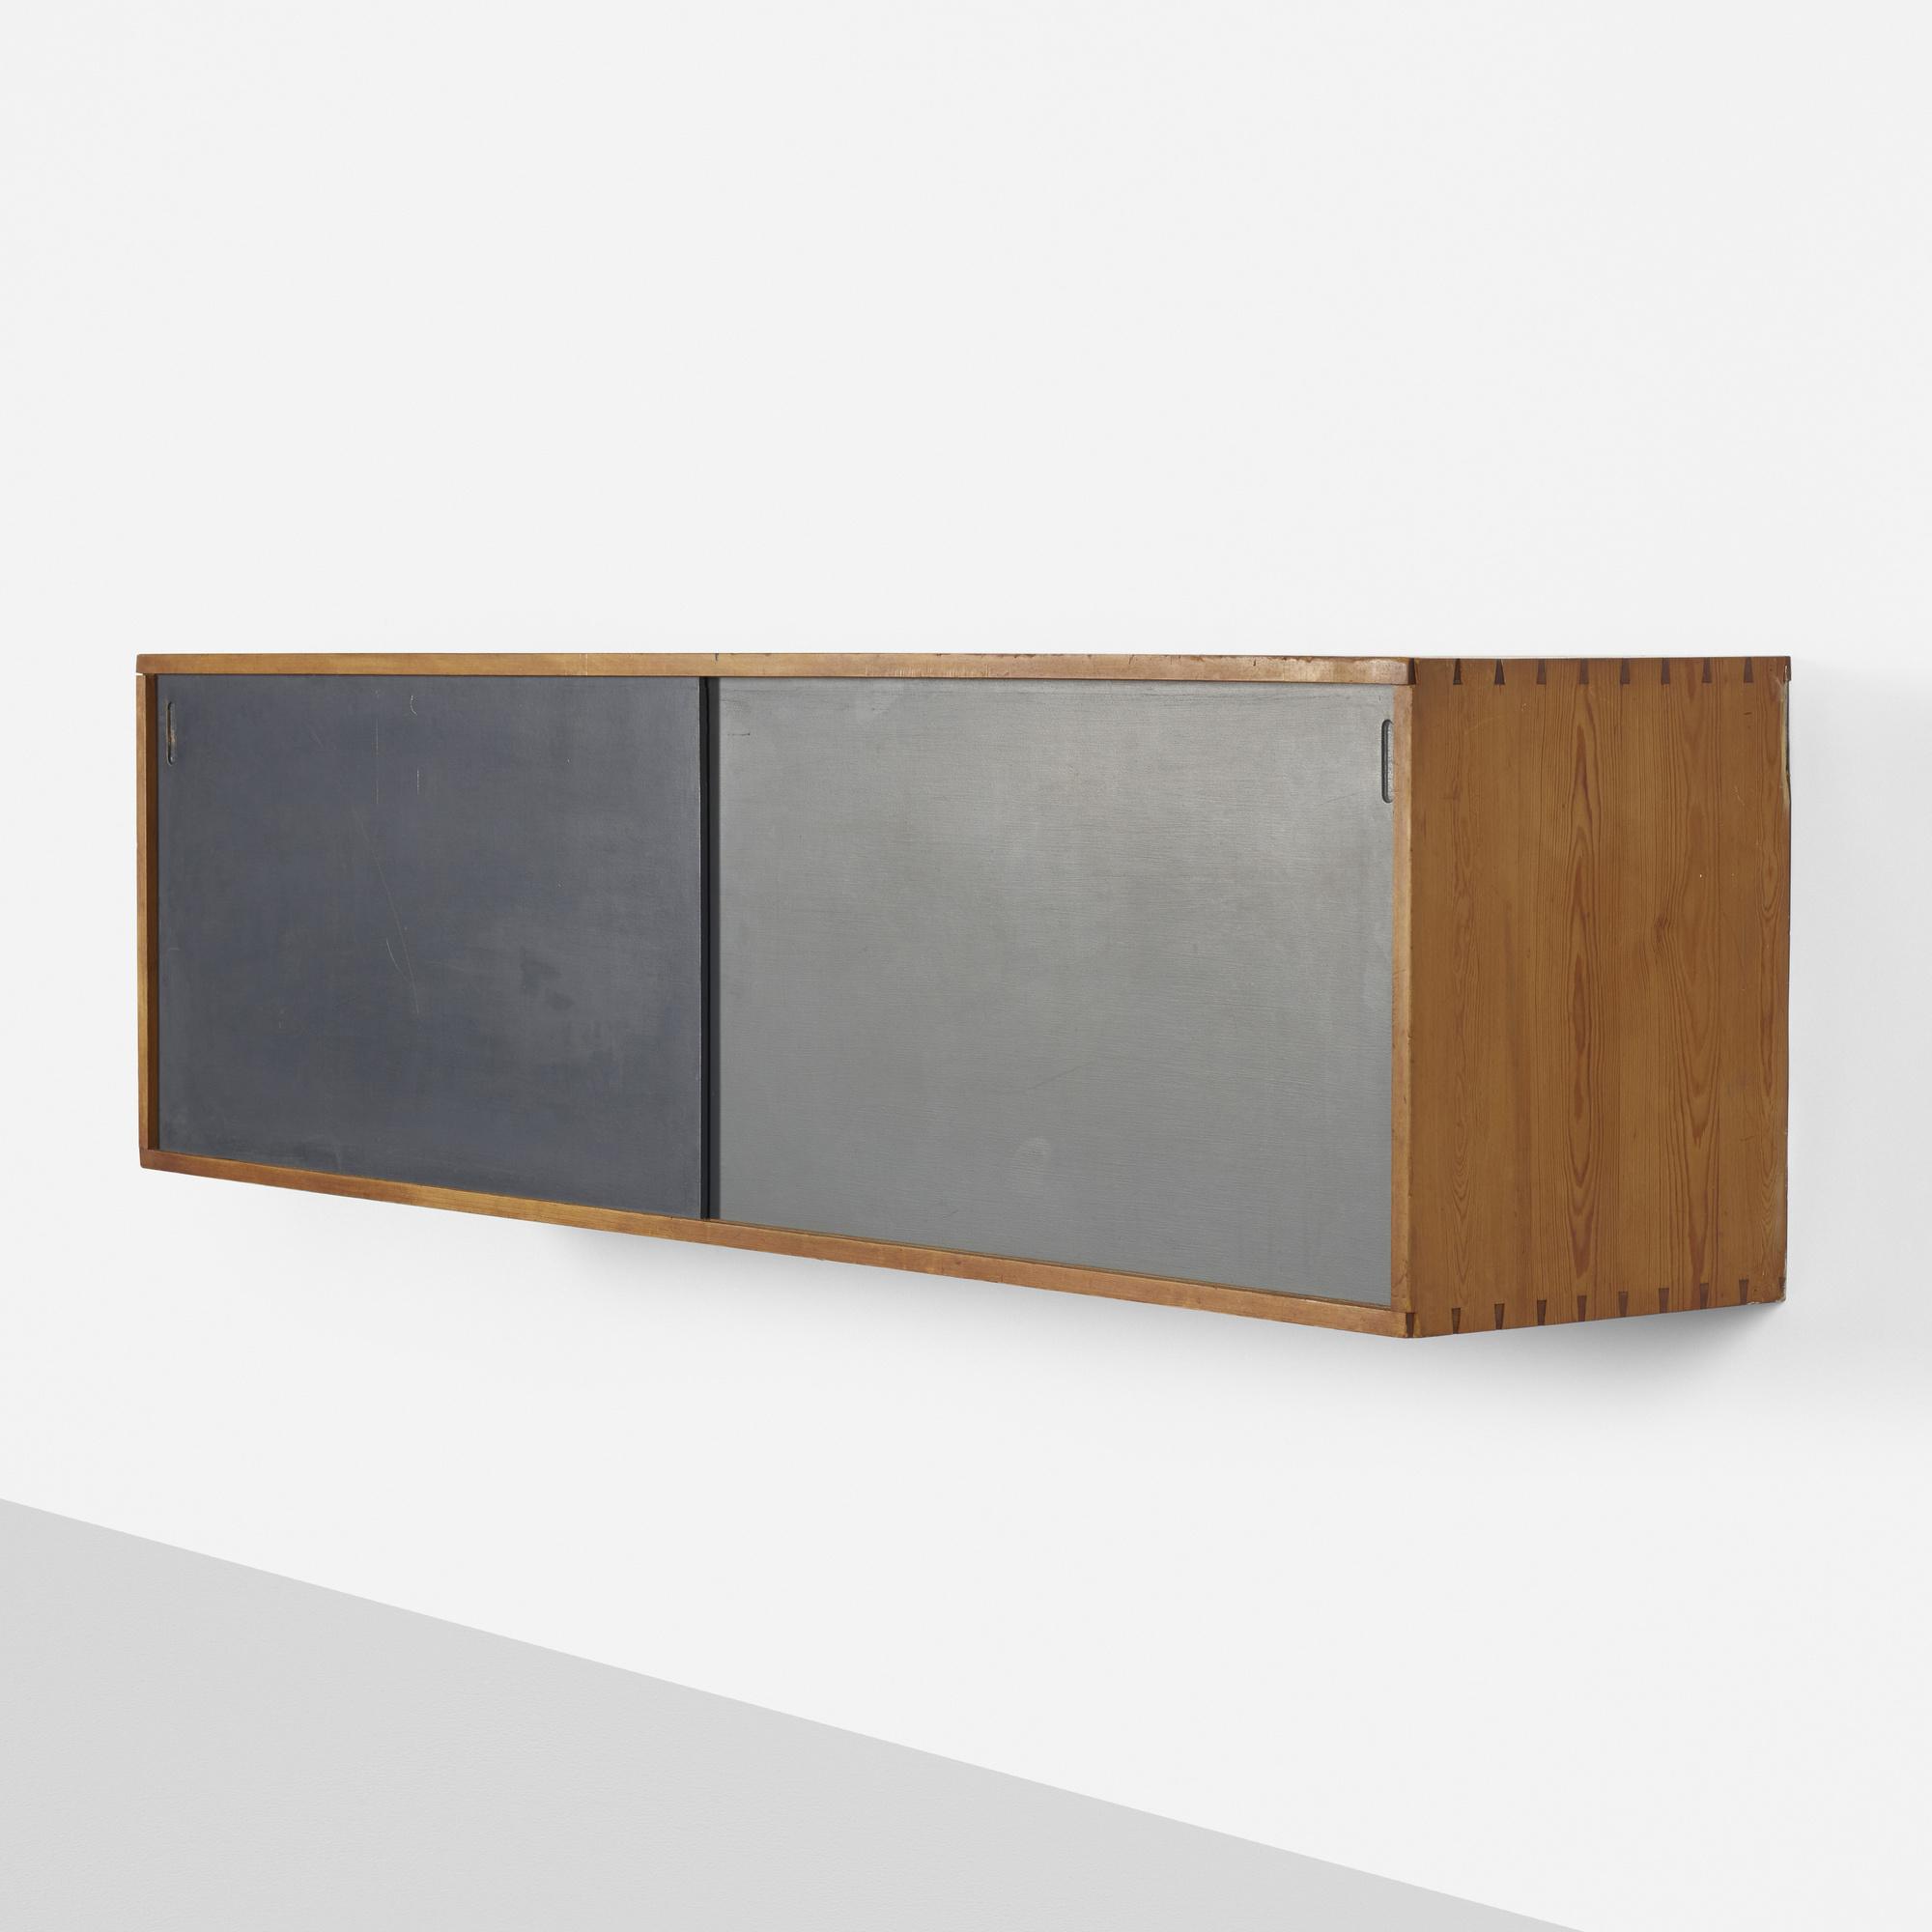 Lige ud 192: HENRIK IVERSEN AND HARALD PLUM, wall-mounted cabinet RR83